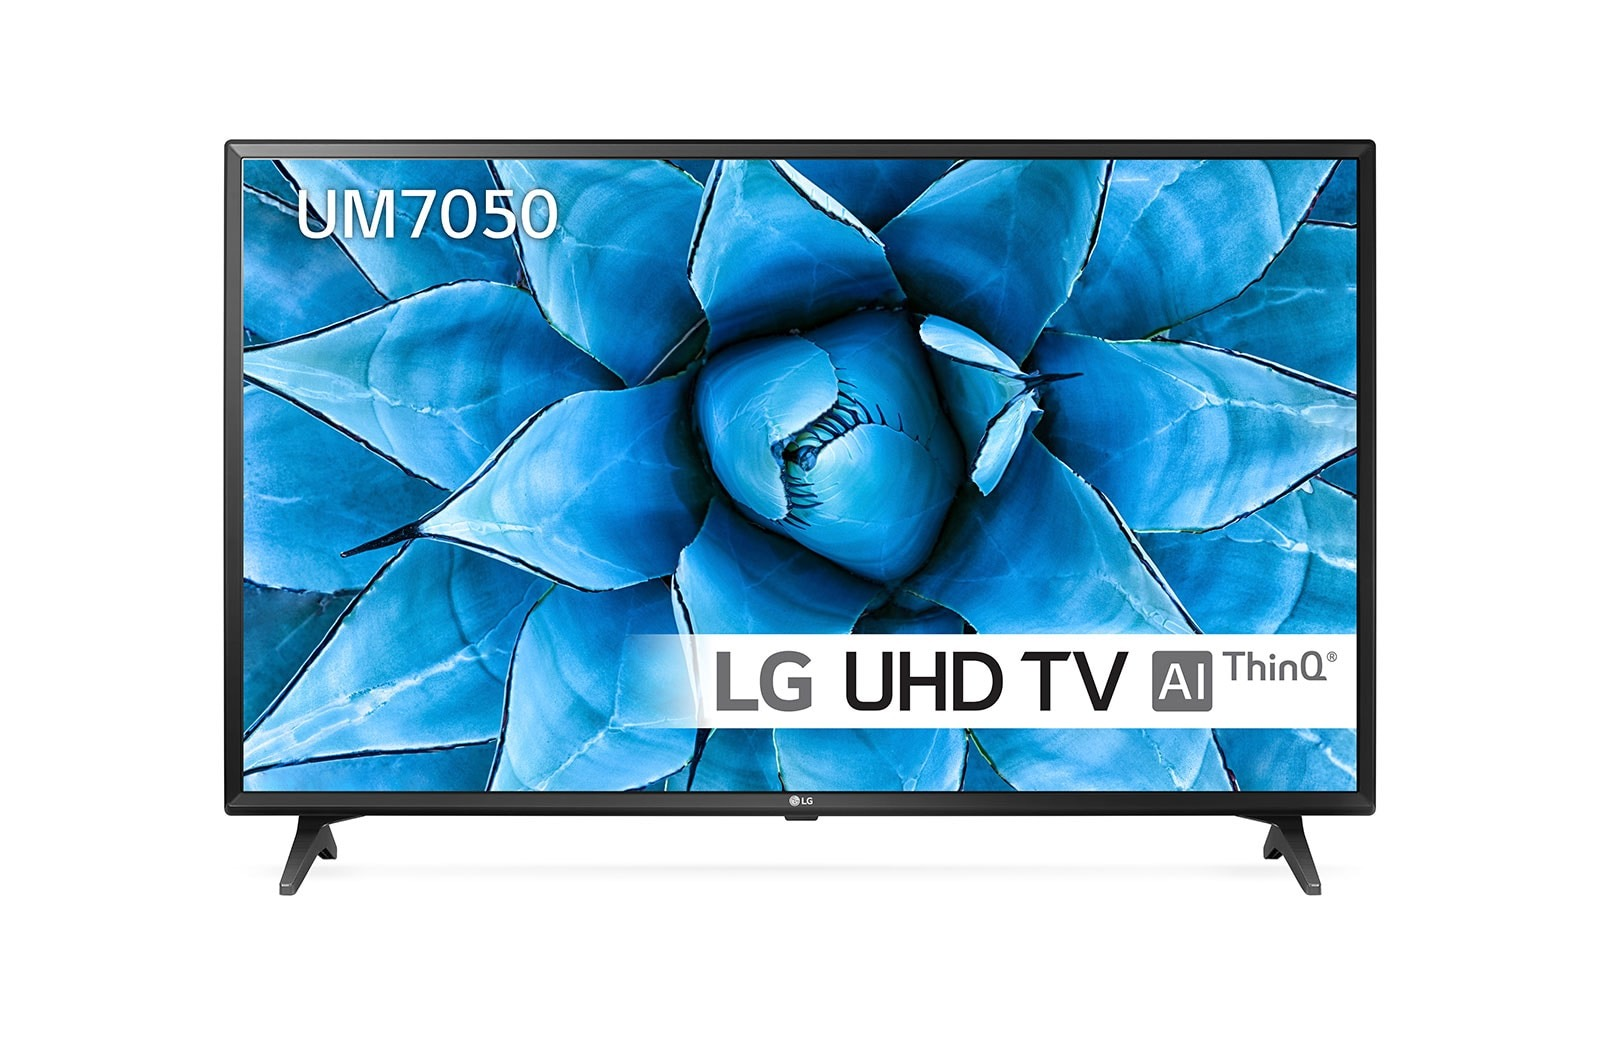 Korting LG 43UM7050 UHD TV